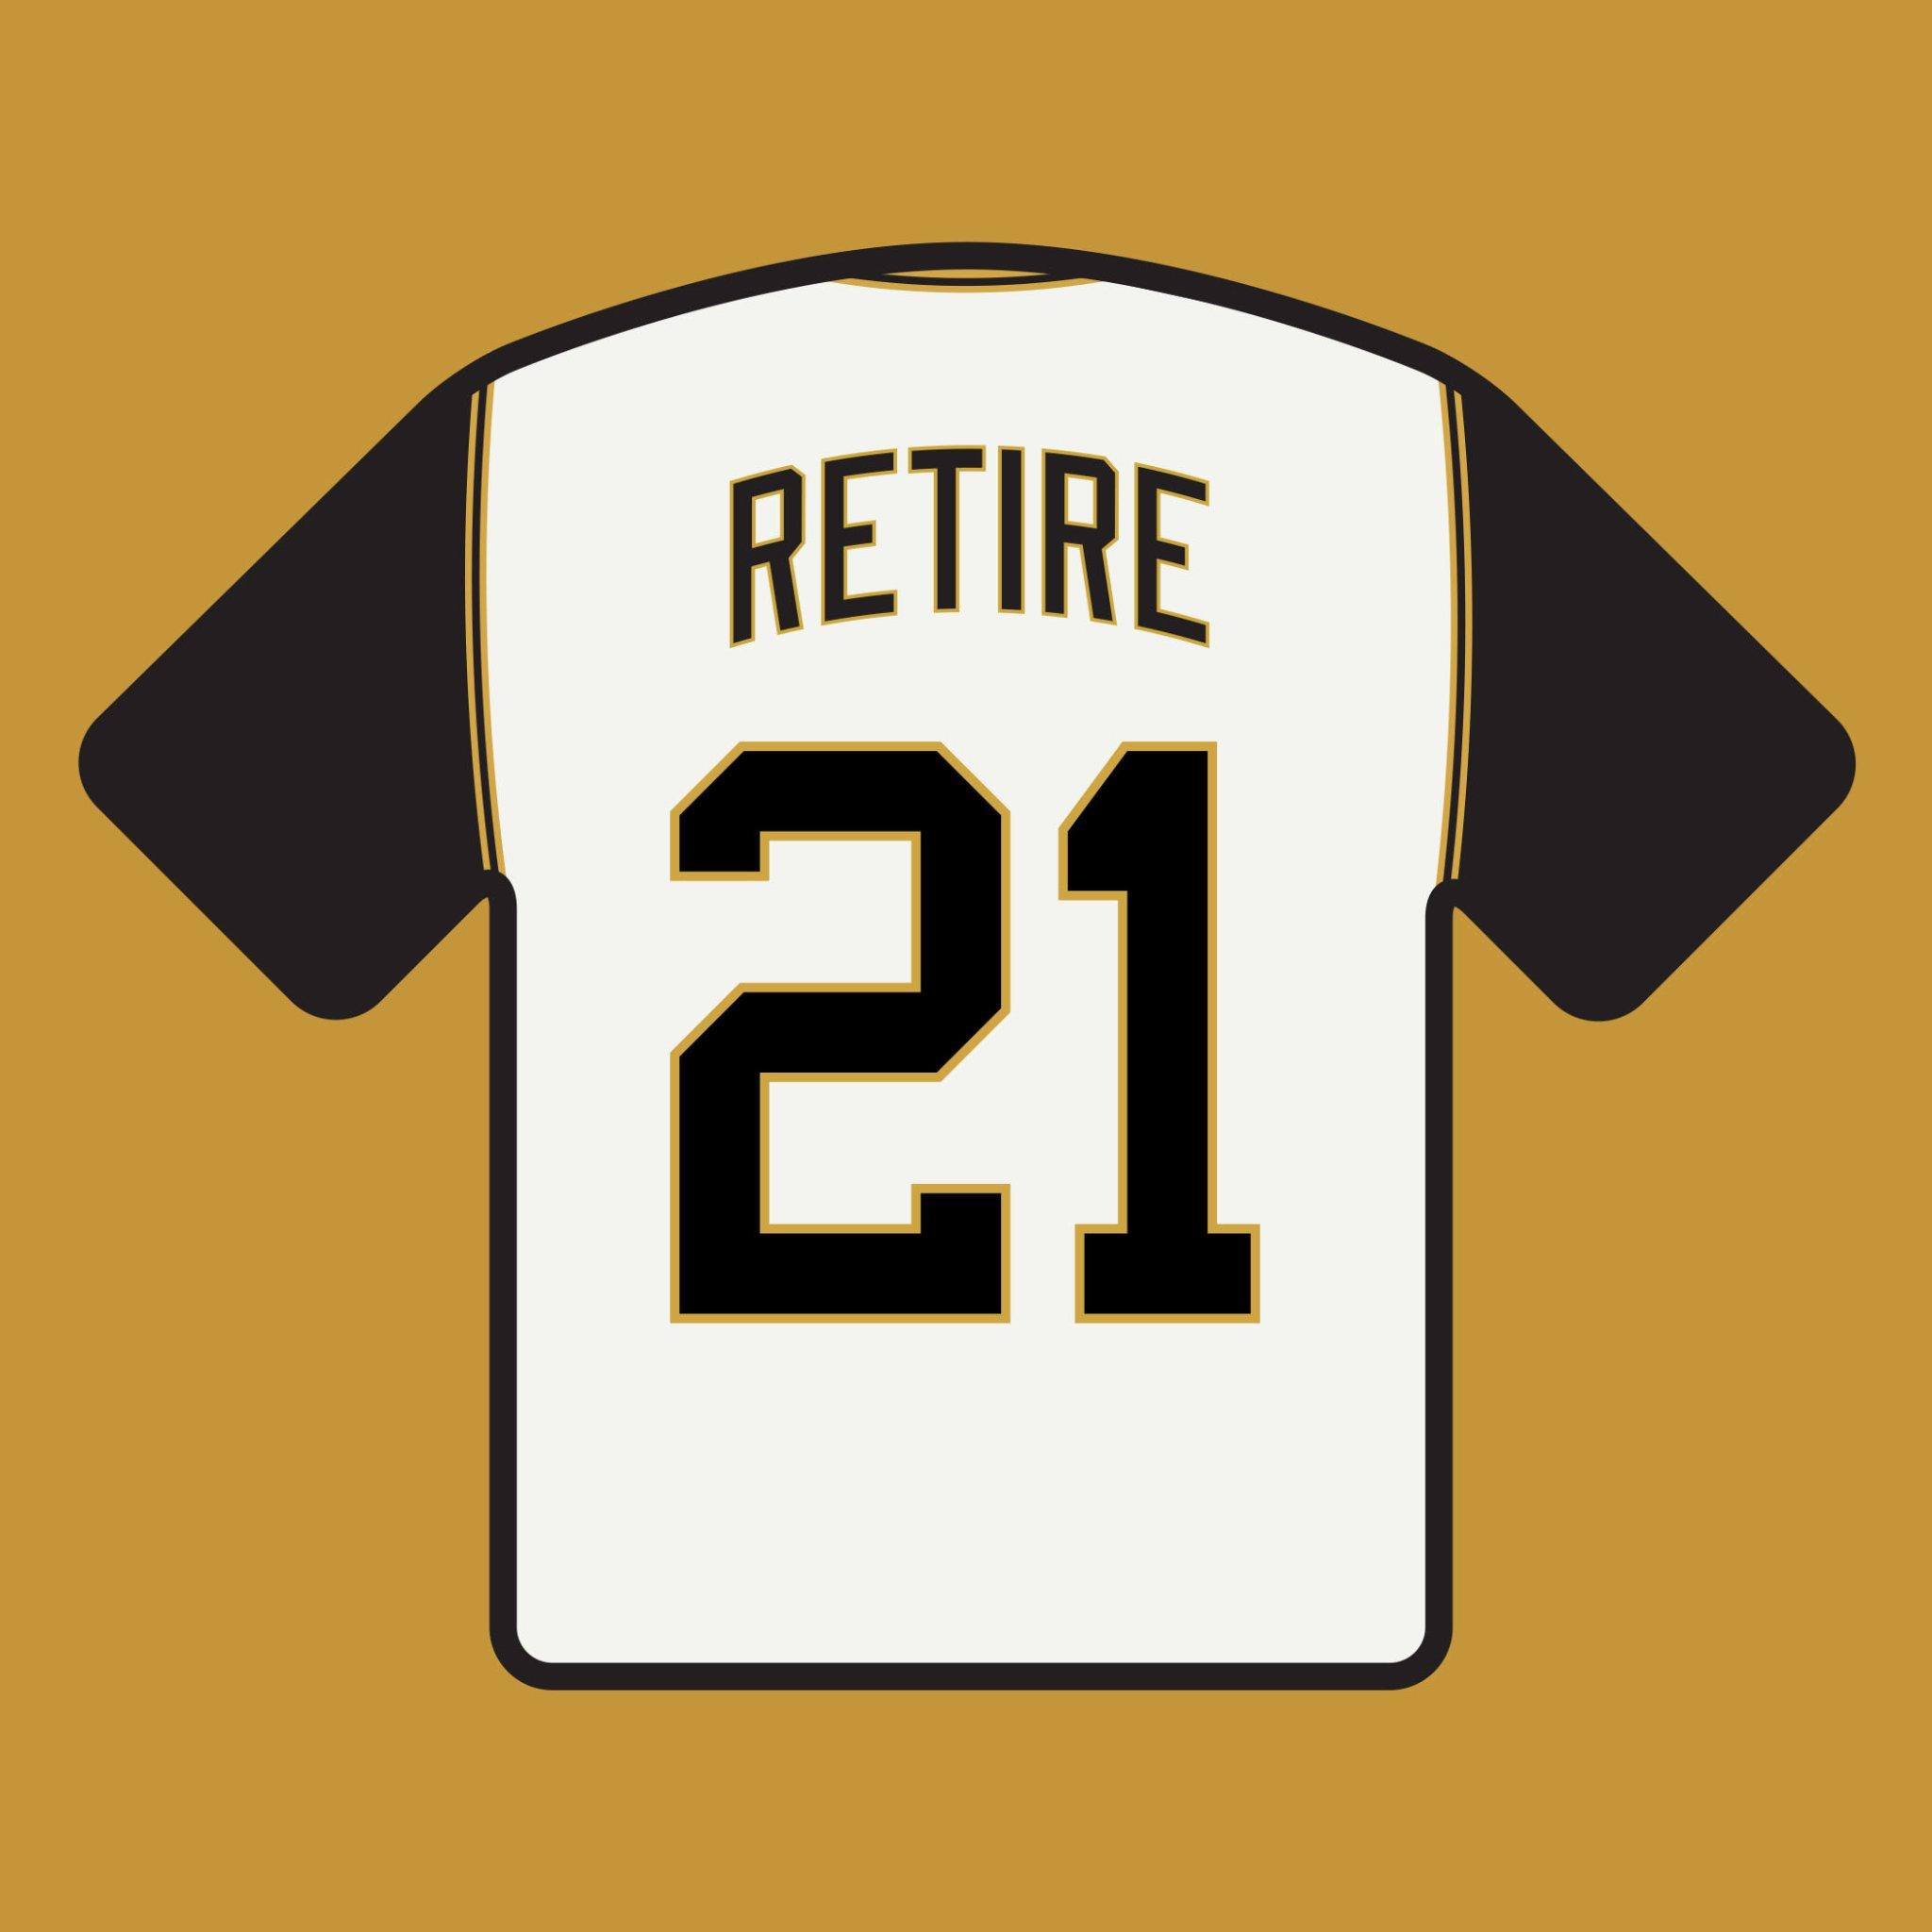 retire 21 retiretwentyone twitter